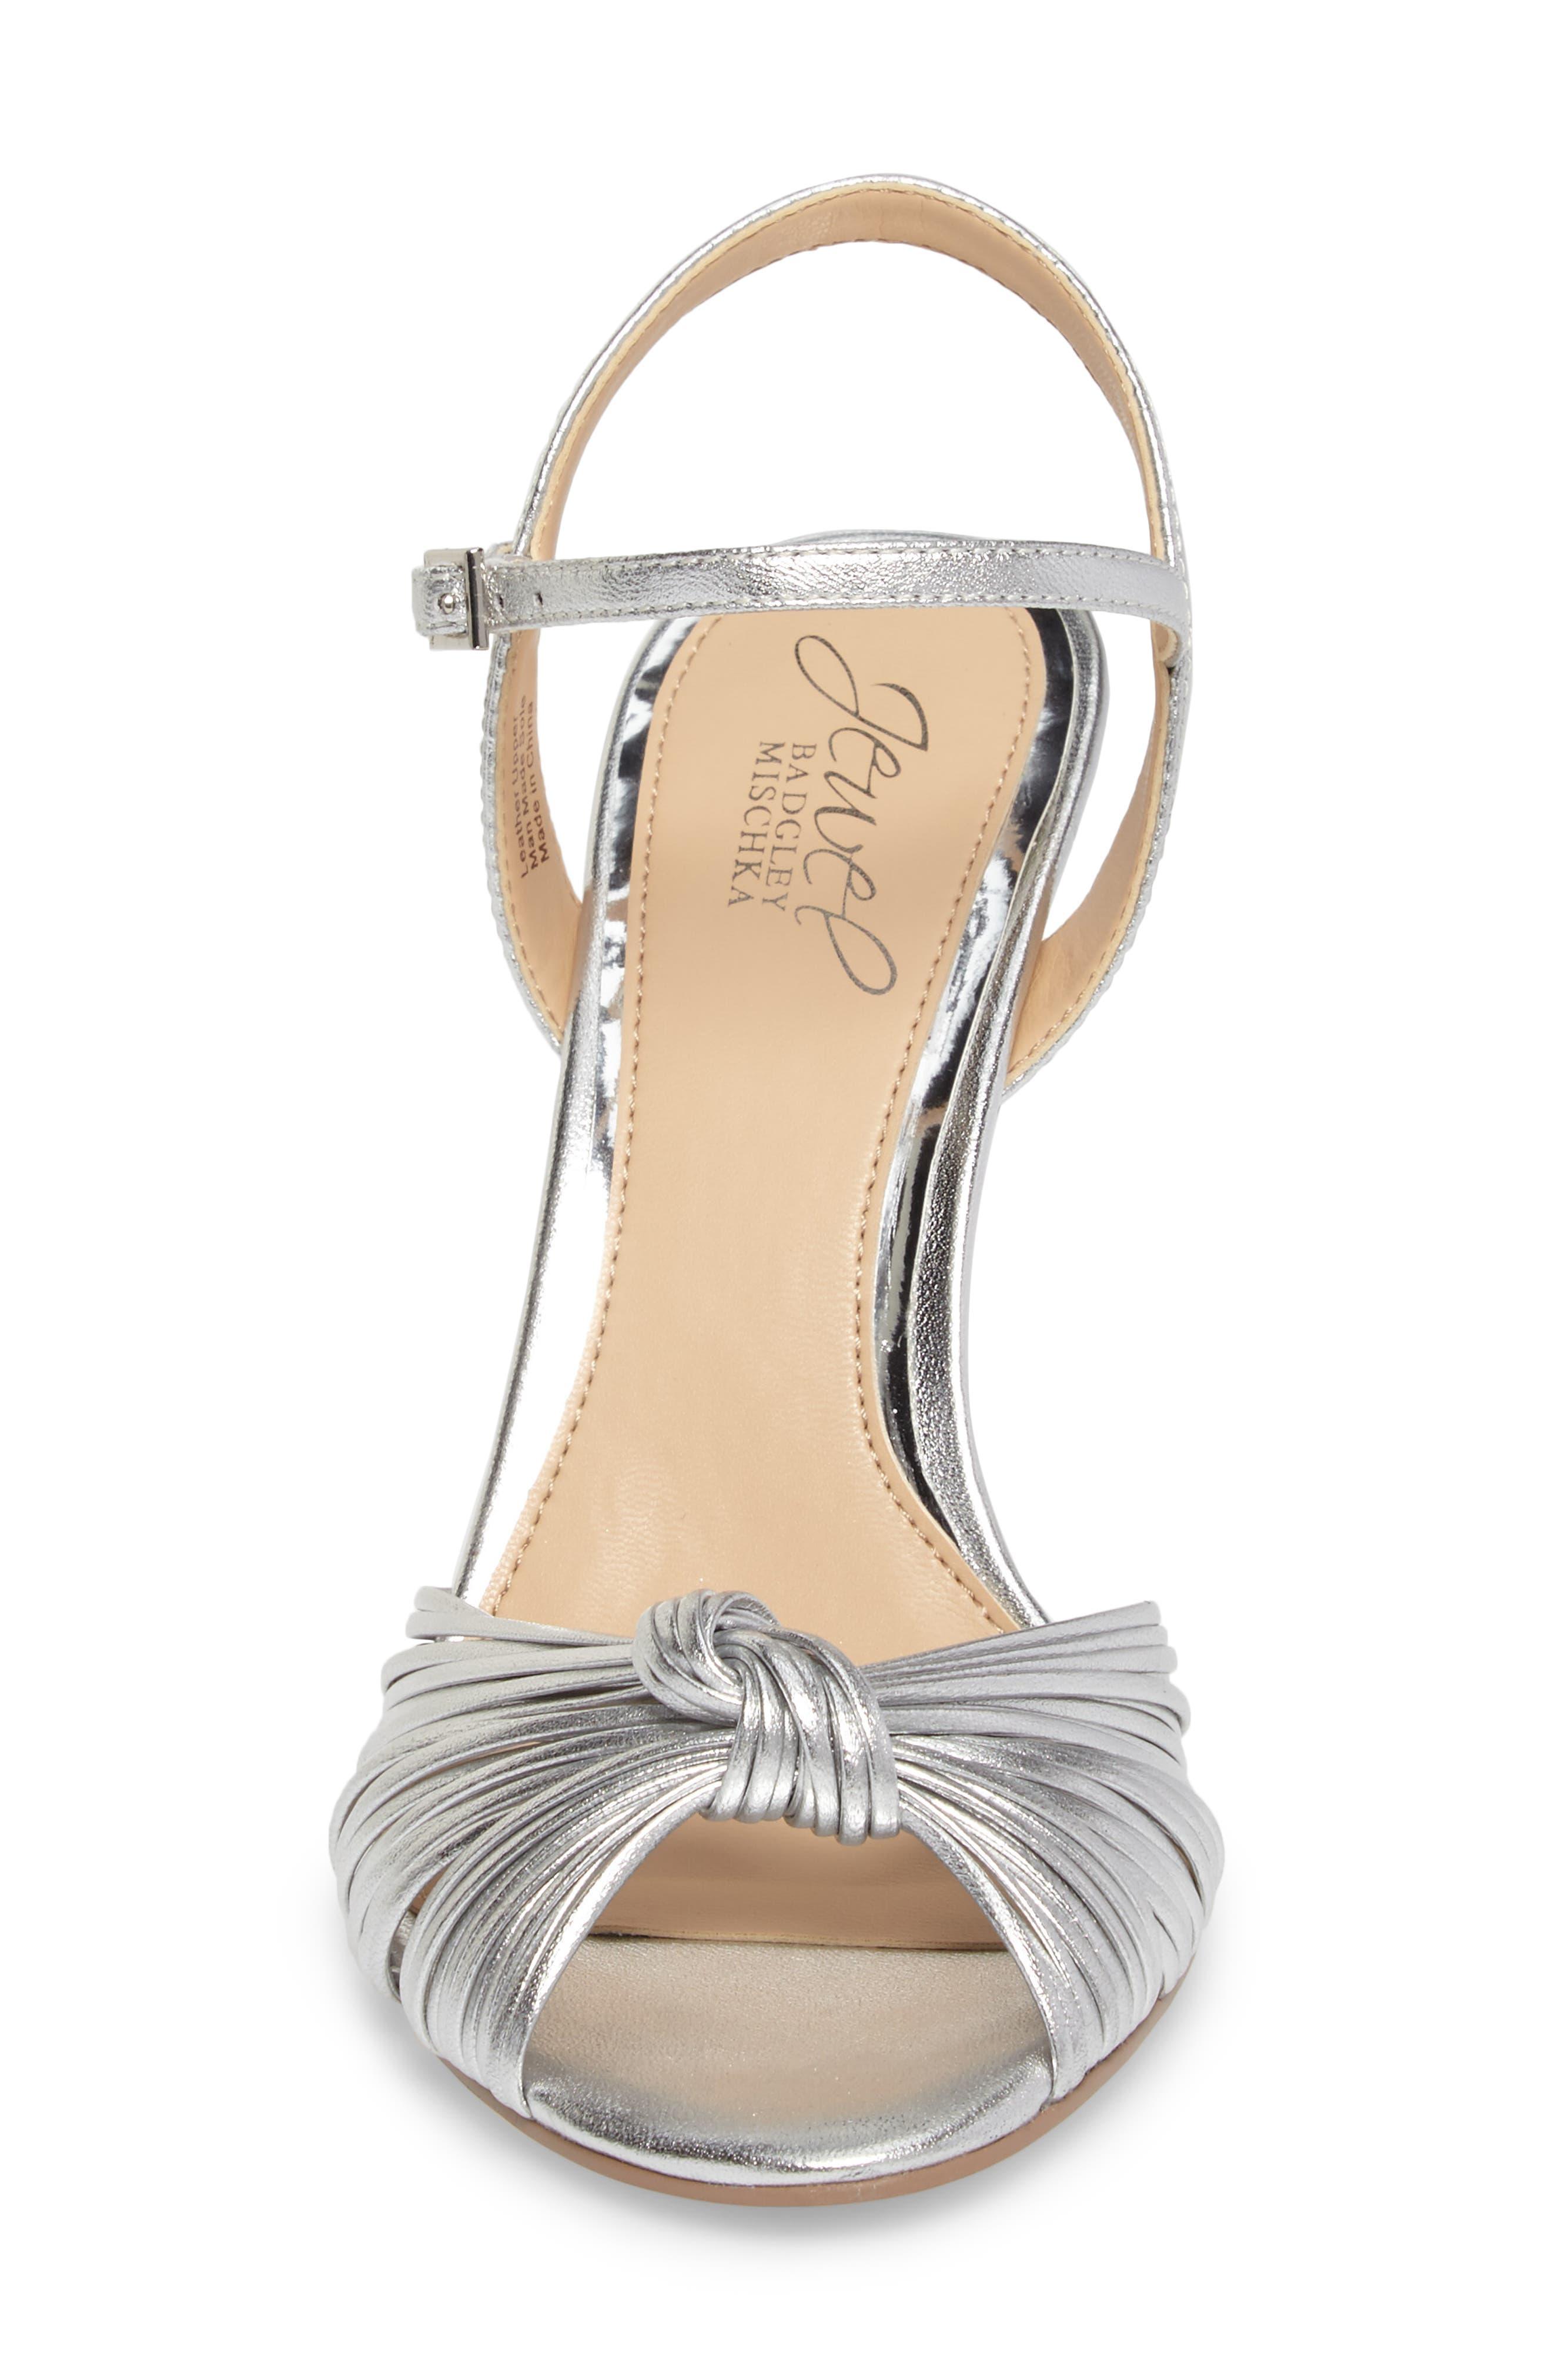 Lady Ankle Strap Sandal,                             Alternate thumbnail 4, color,                             046